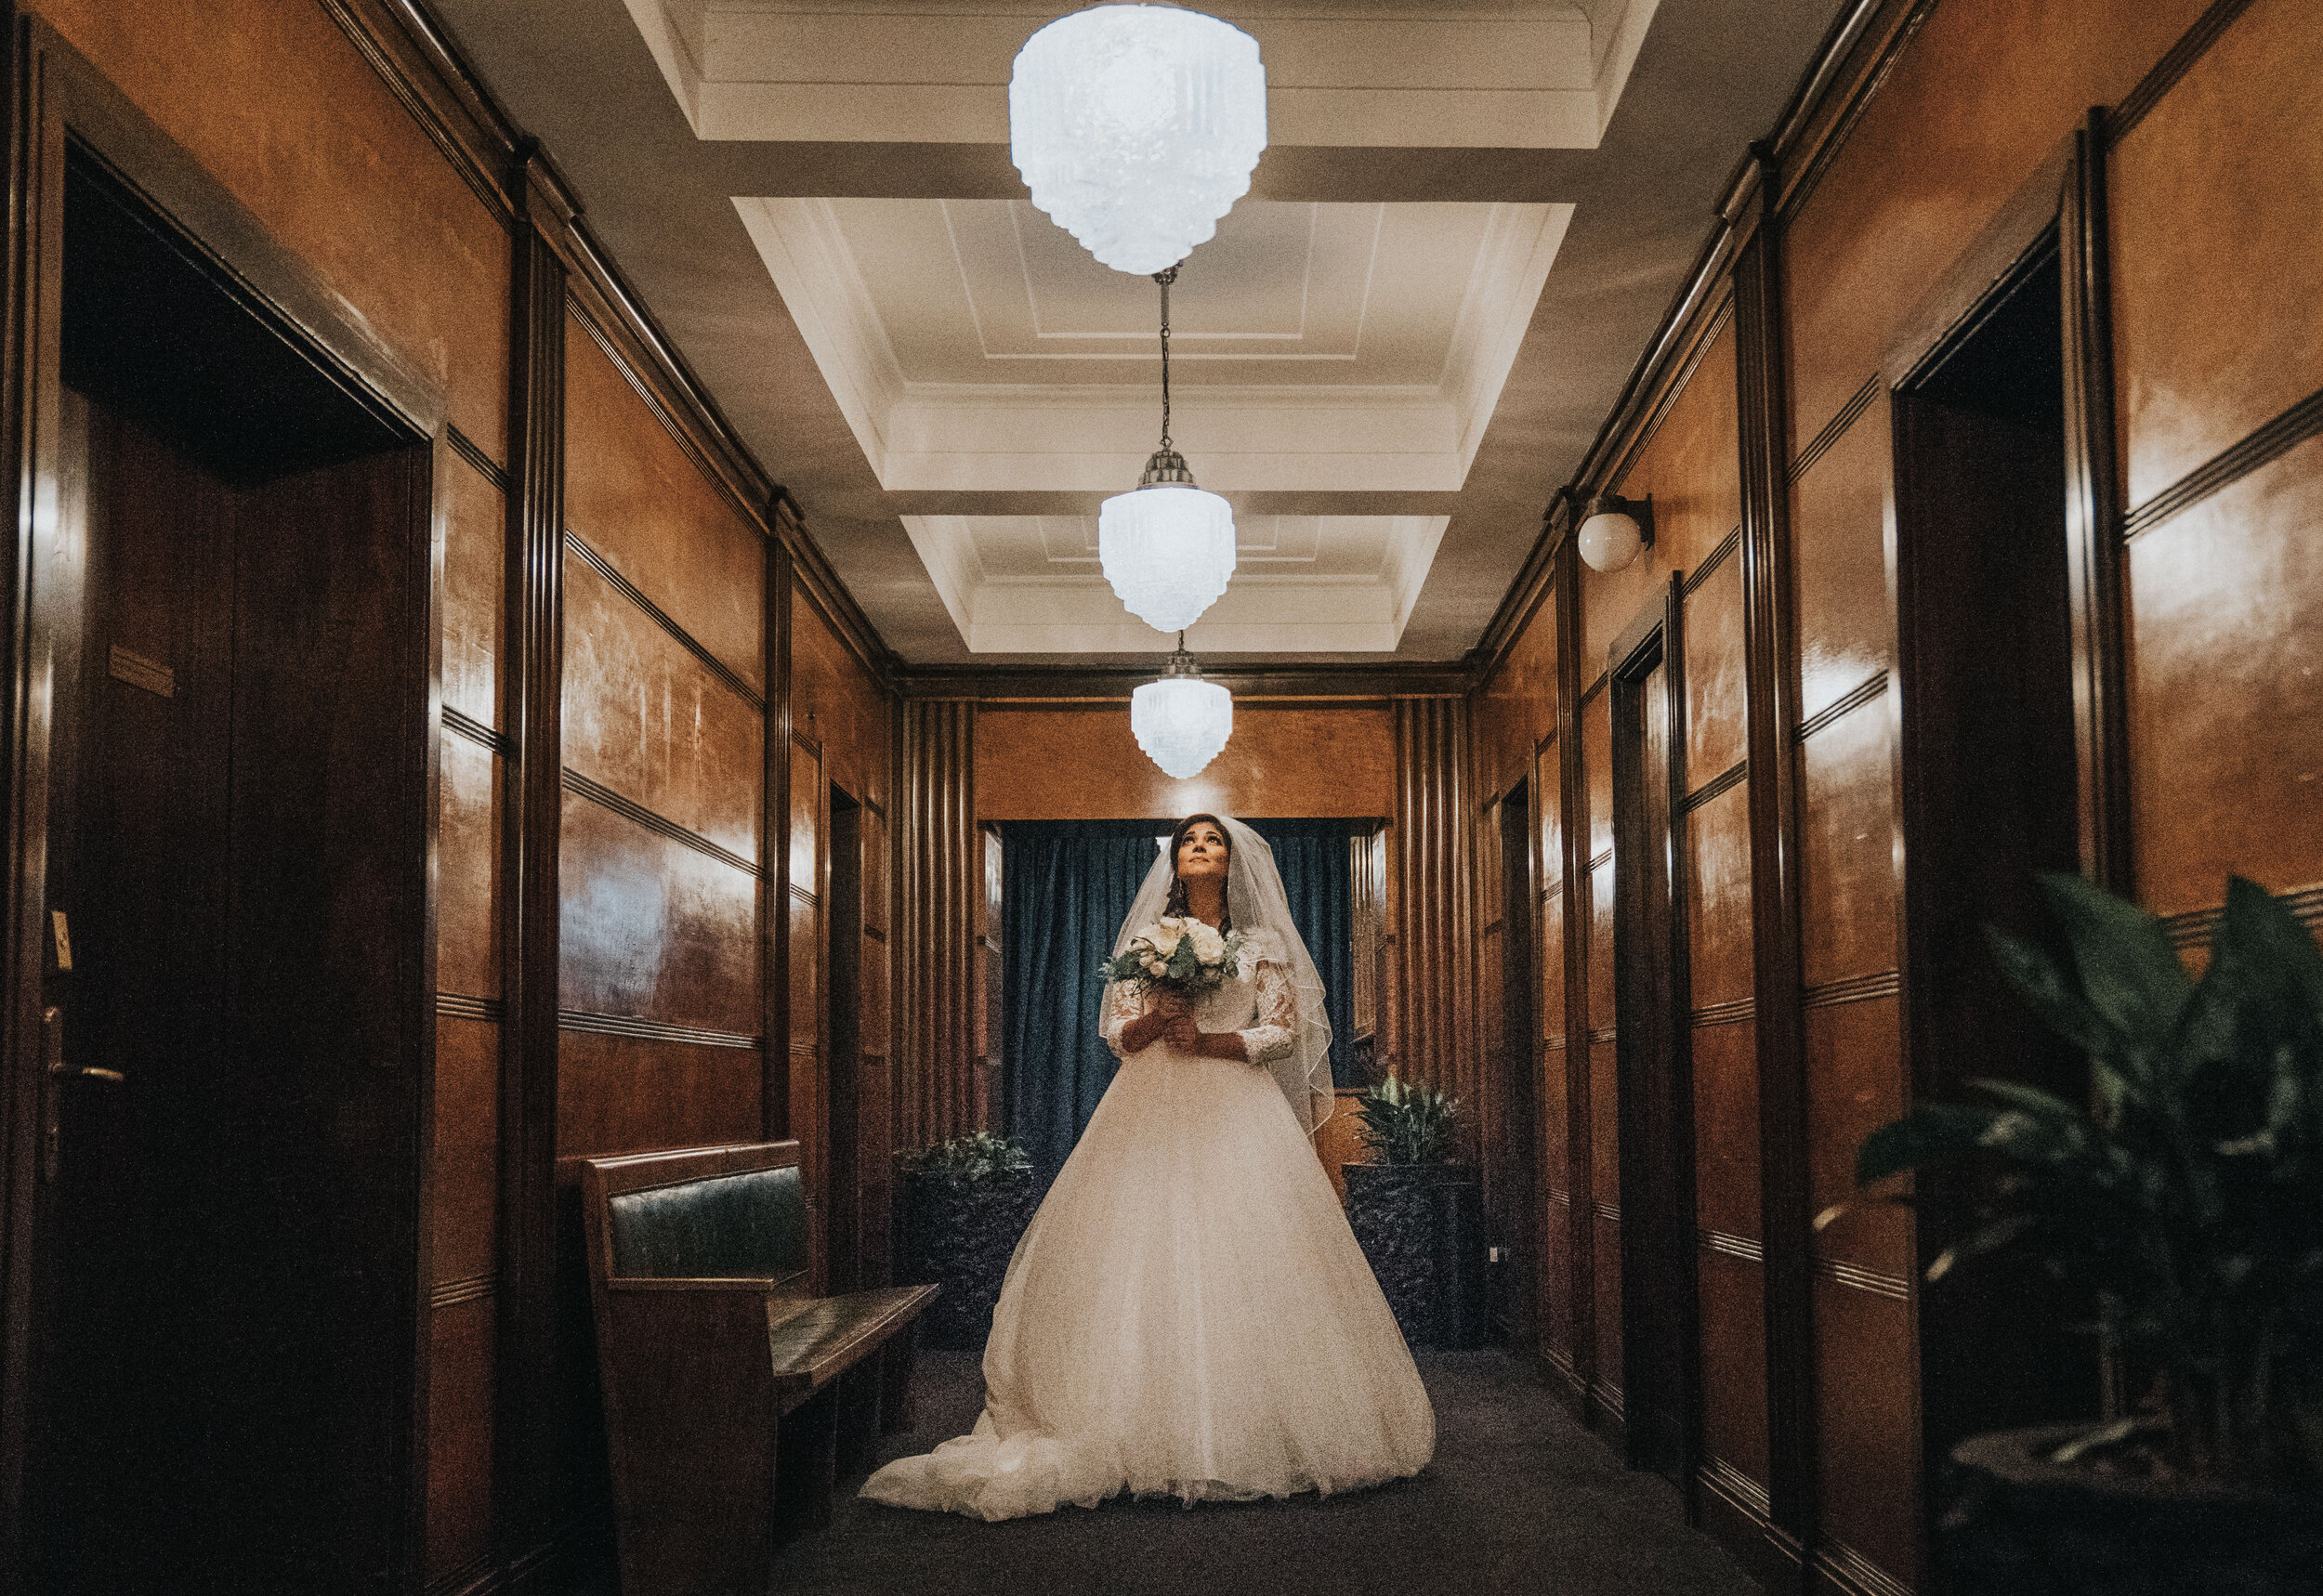 east-london-wedding-photographer-videographer-patriot-square-apartments-28